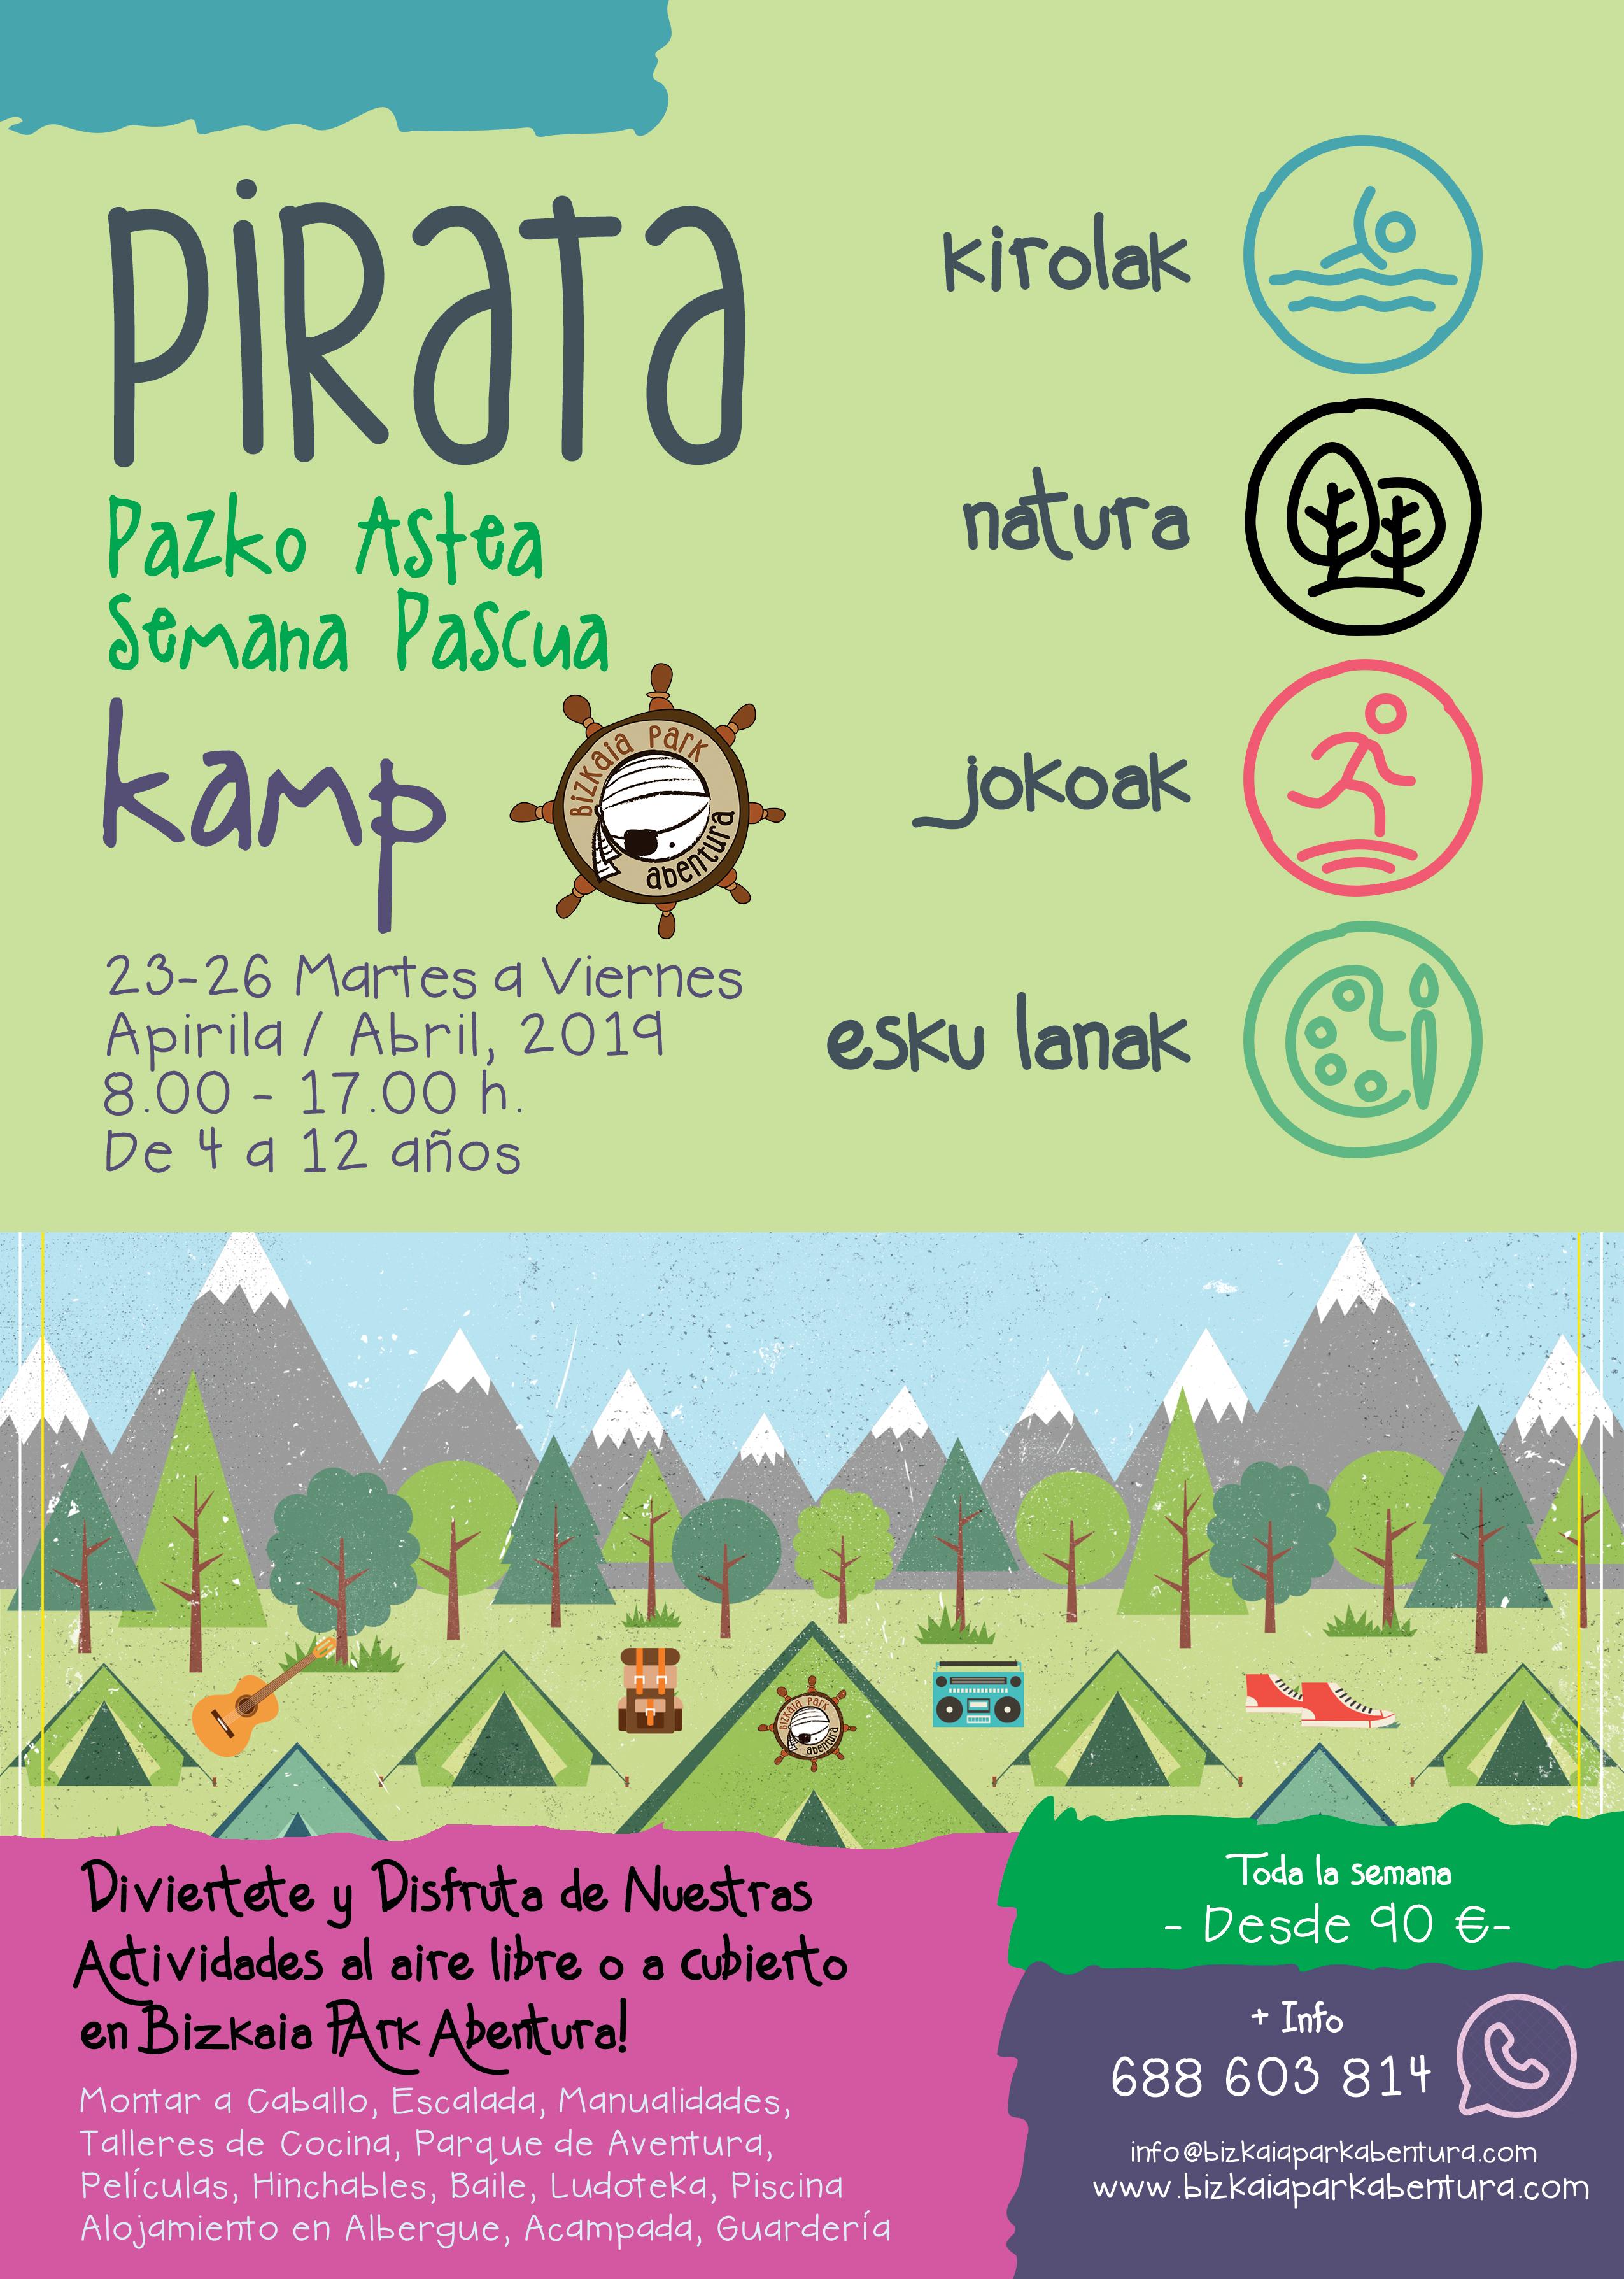 Pirata Summer Kamp